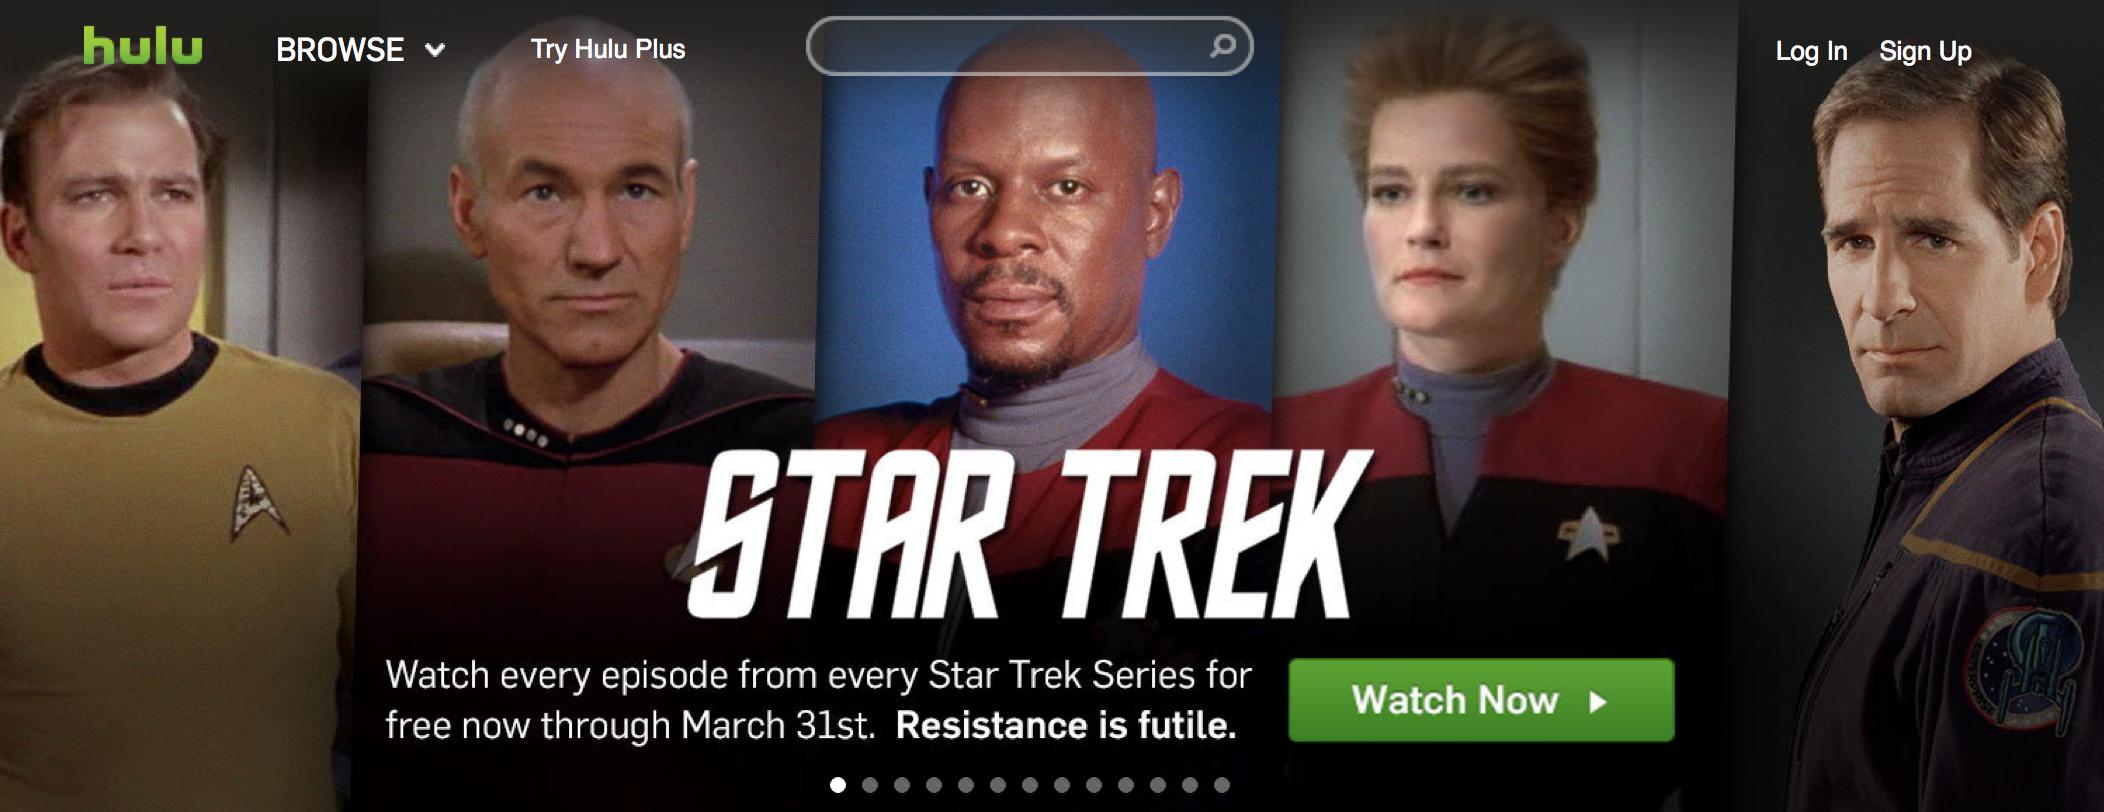 Sådan får du Hulu Plus på din Chromecast